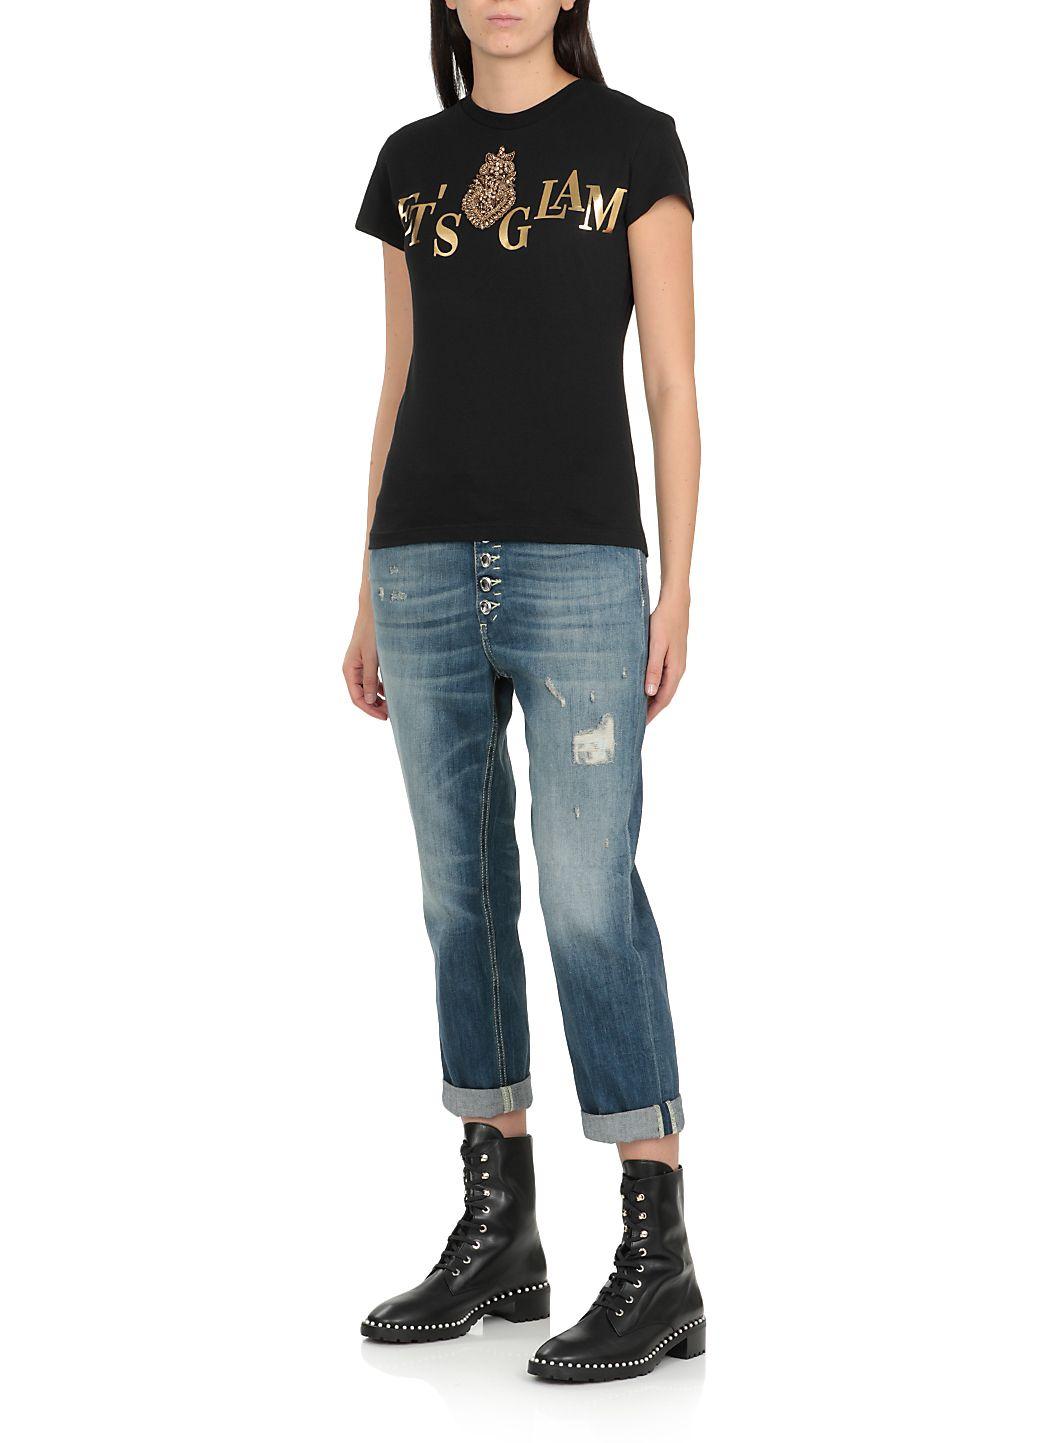 CottonT-shirt